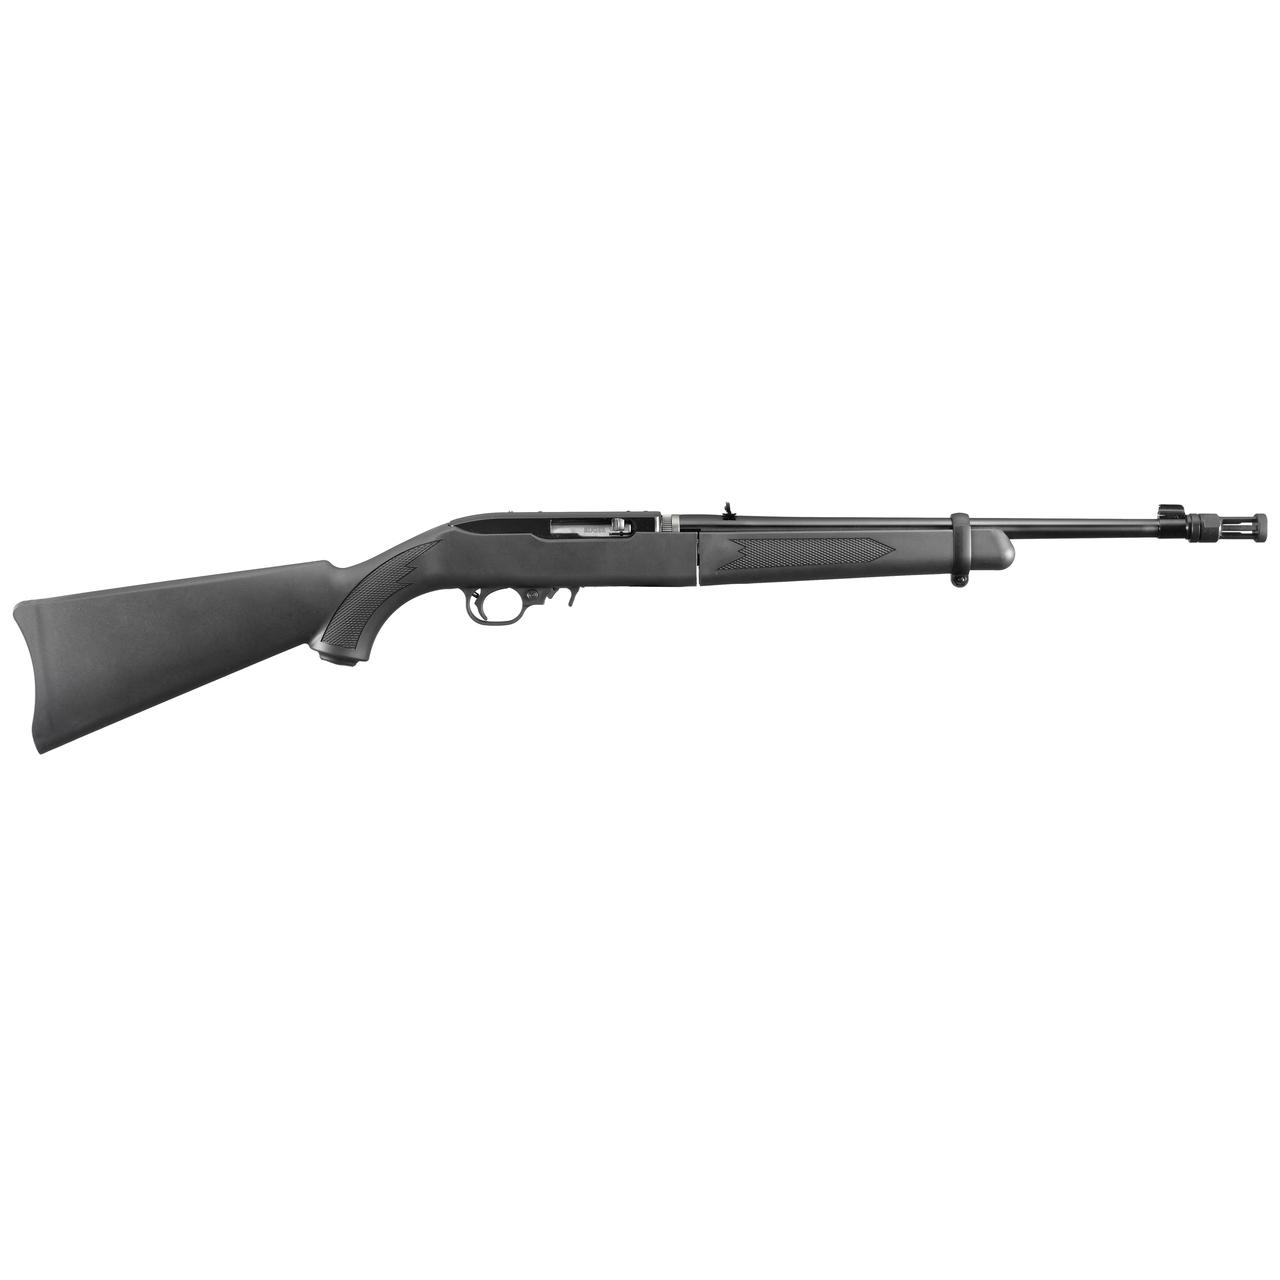 Ruger 10/22 Takedown Semi-automatic Rifle 22 LR Black